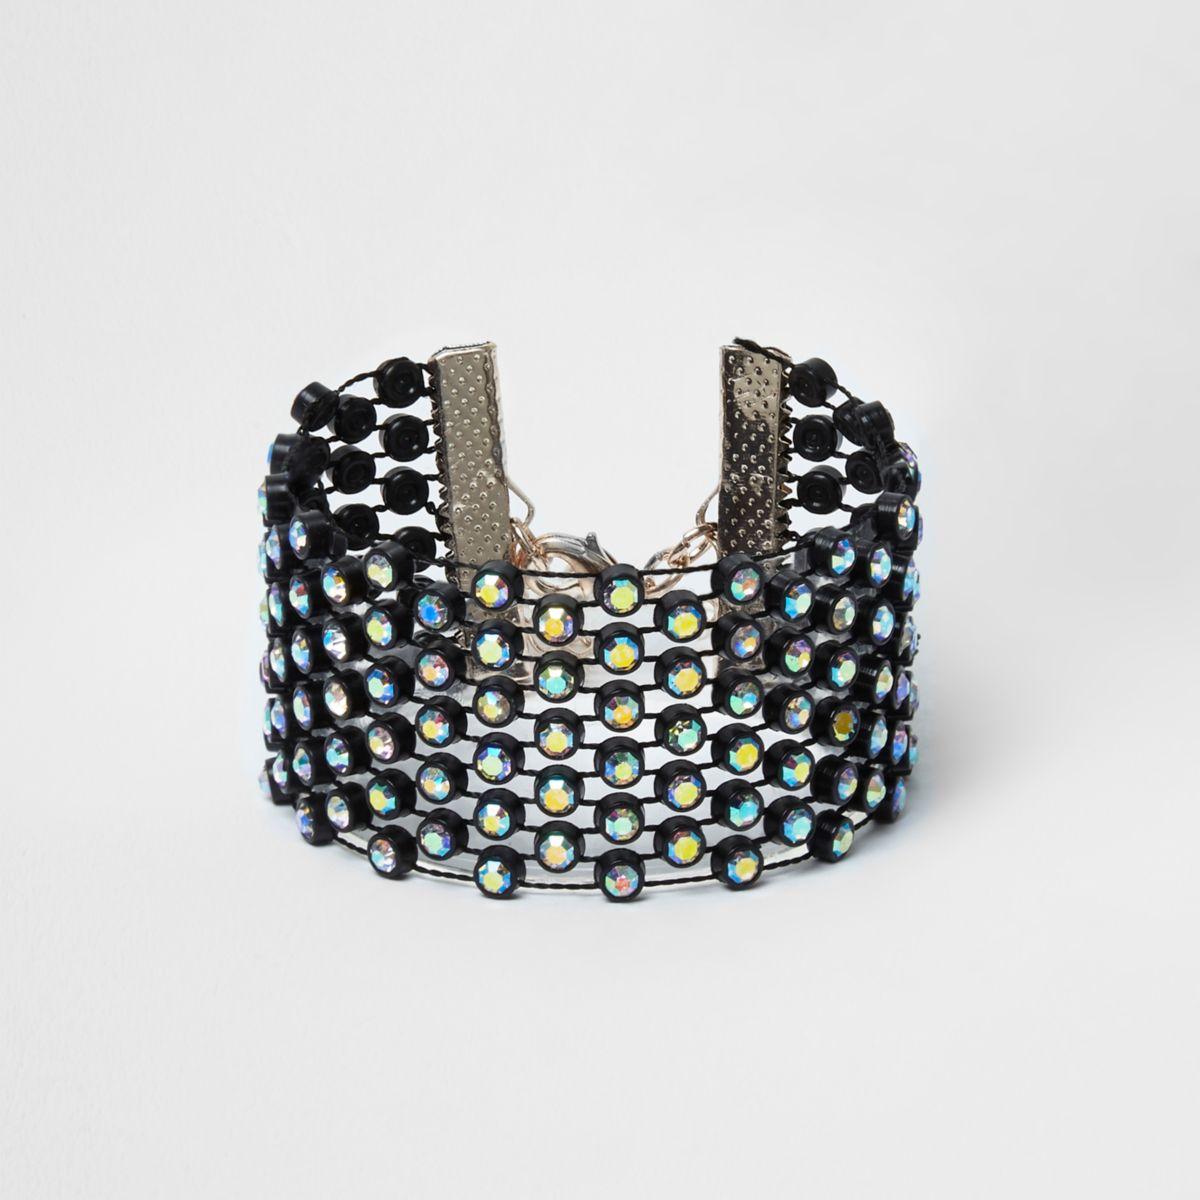 Black rhinestone threaded bracelet